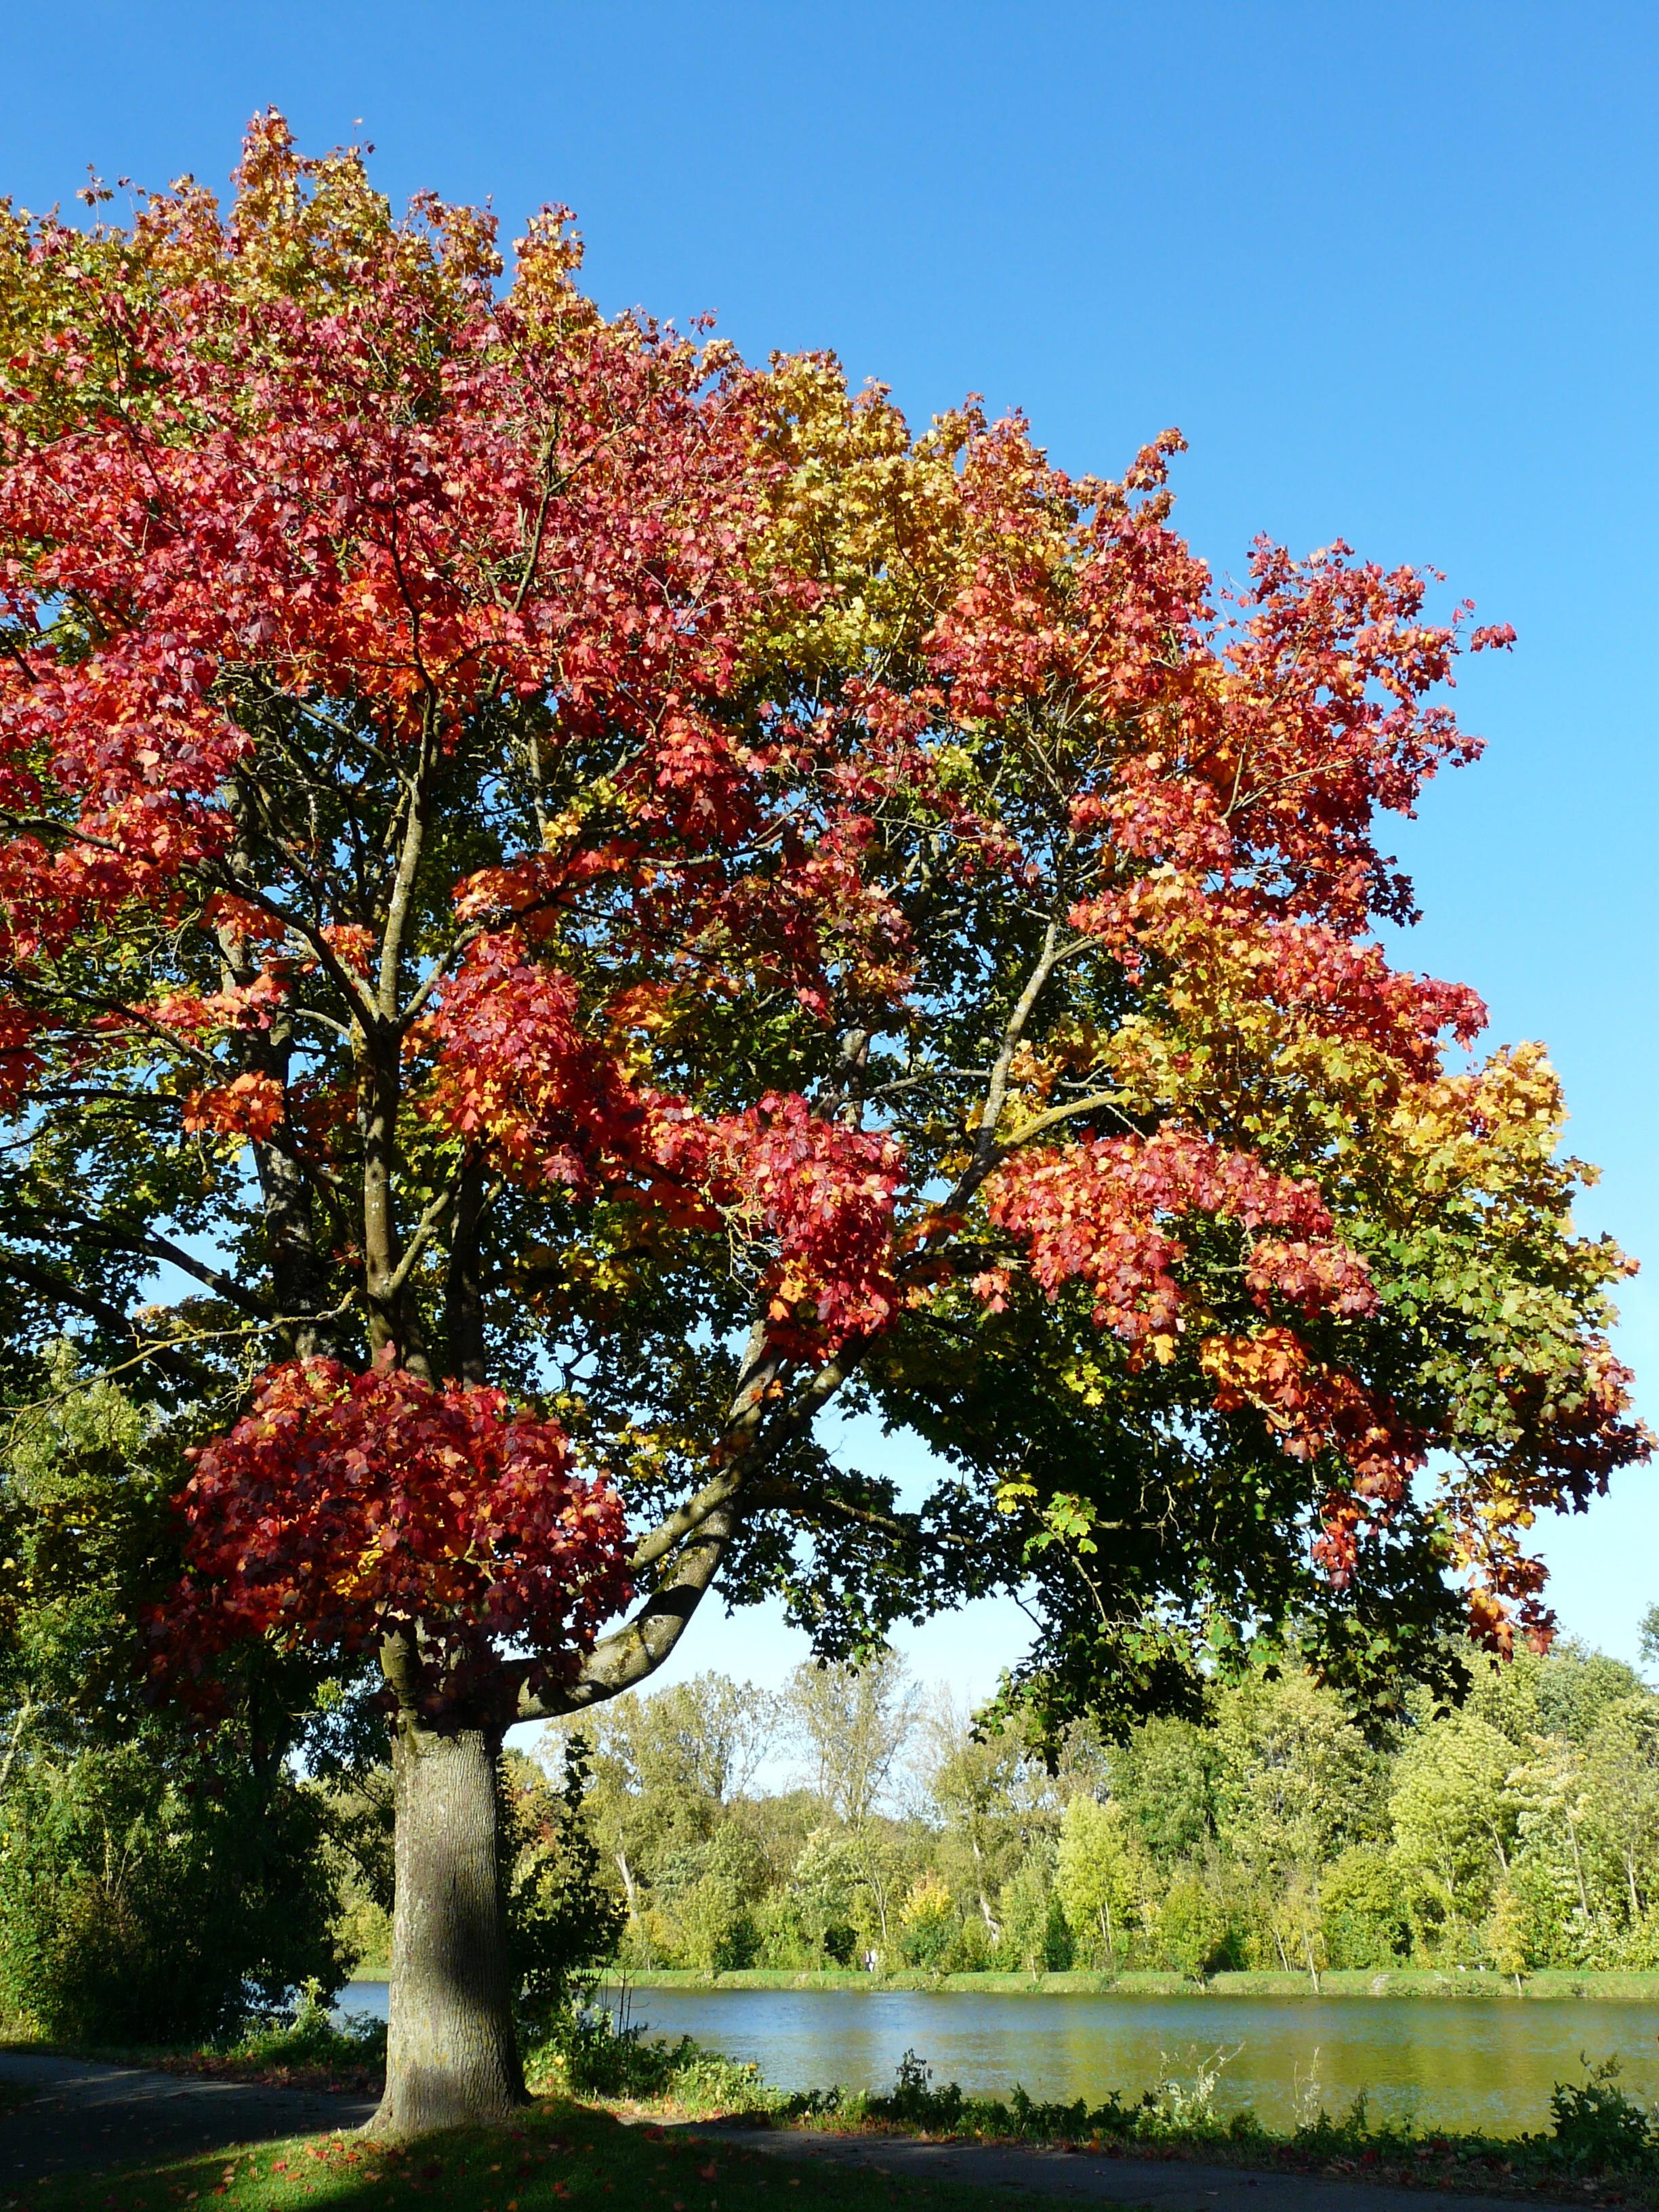 Free Images : nature, blossom, flower, river, park, botany, garden ...